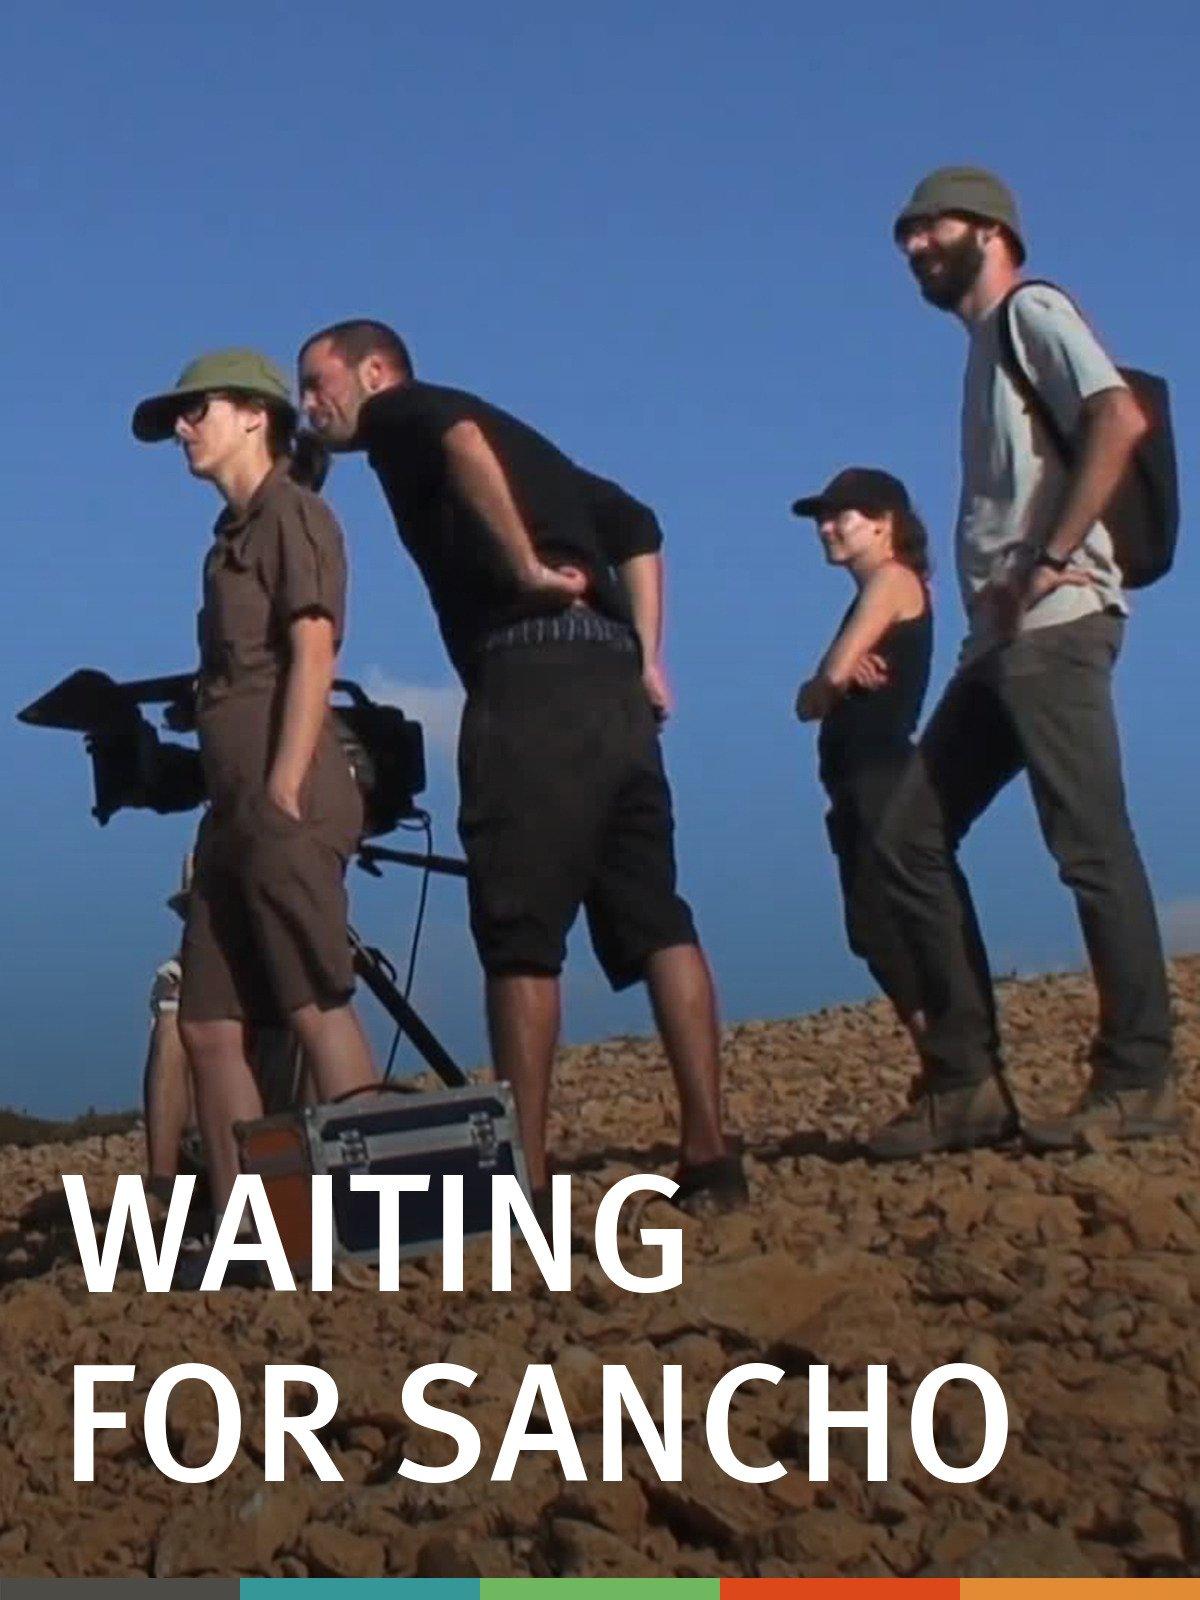 Amazon.com: Waiting for Sancho: Albert Serra, Montse Triola ...